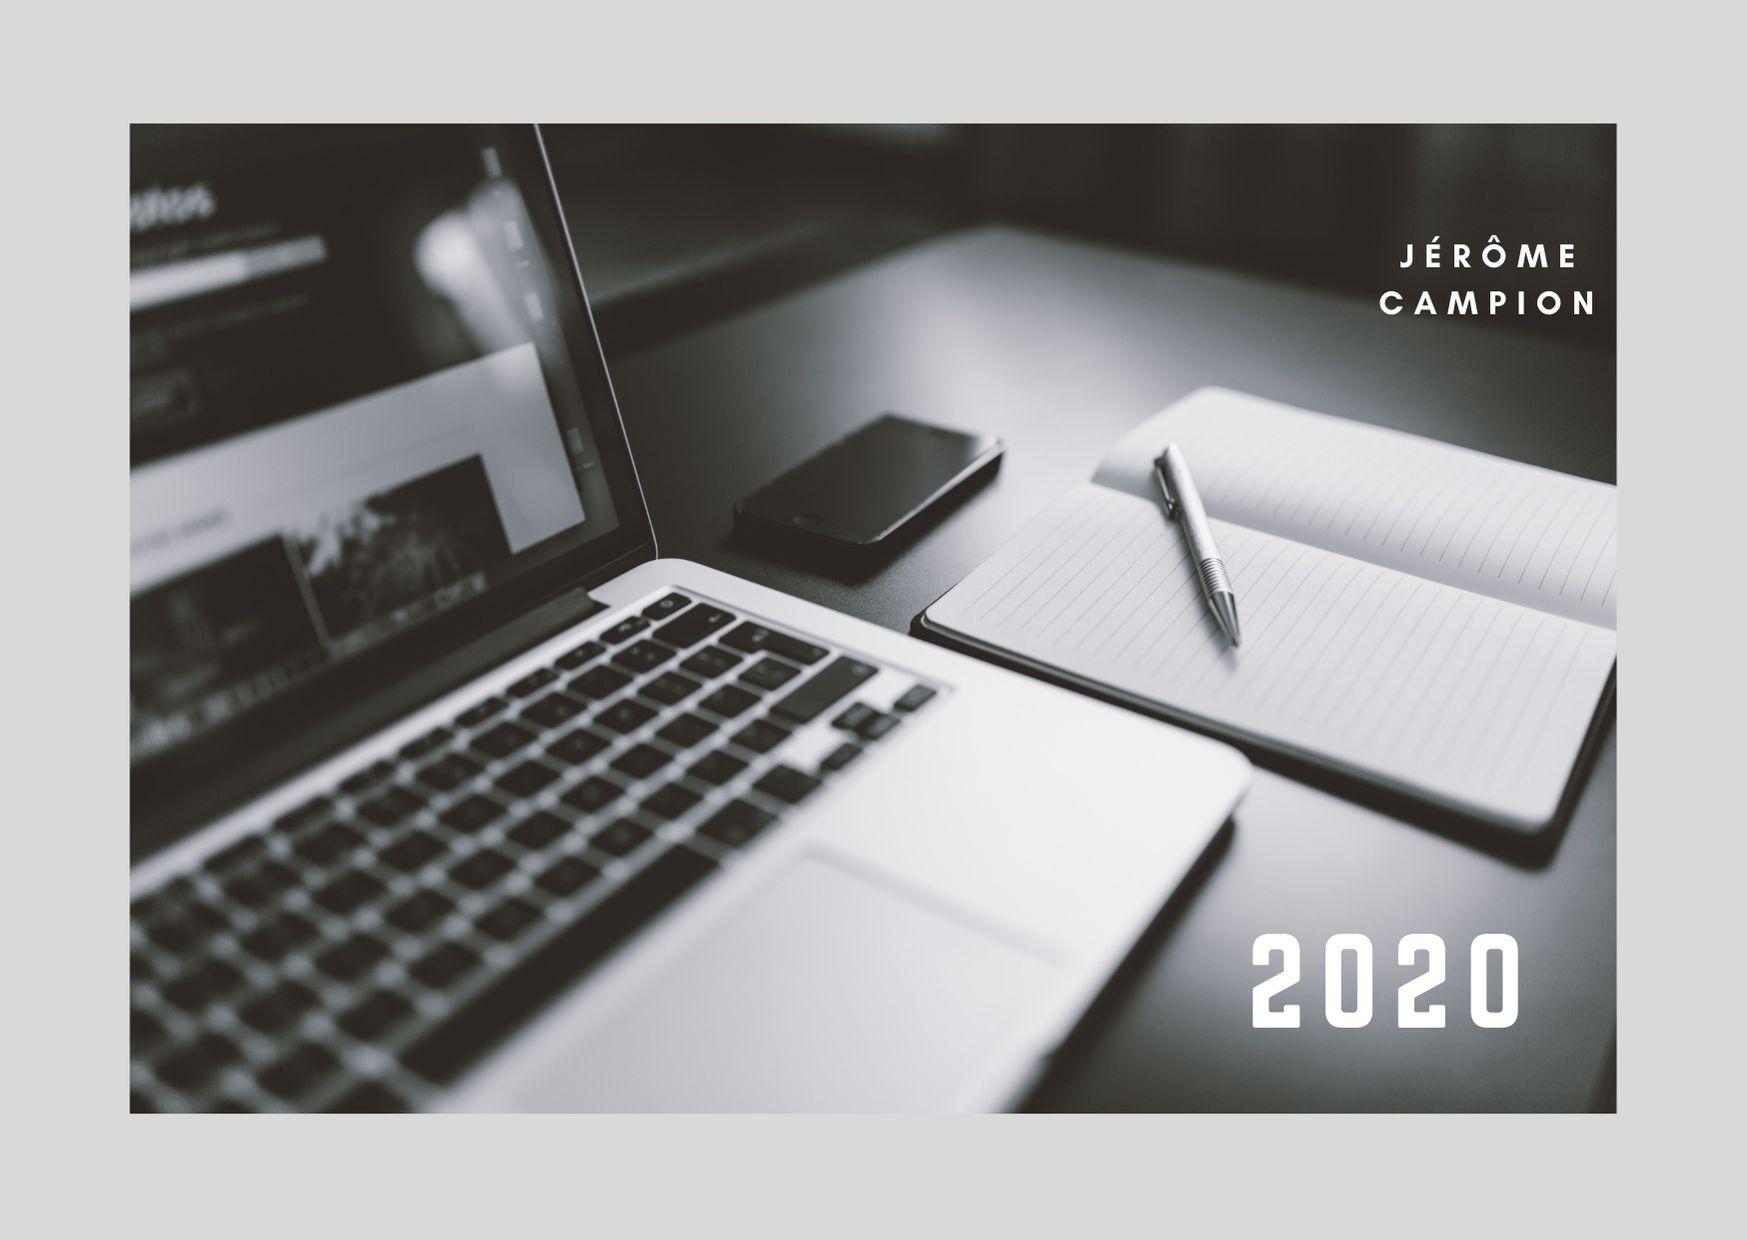 2020 - Jérôme Campion